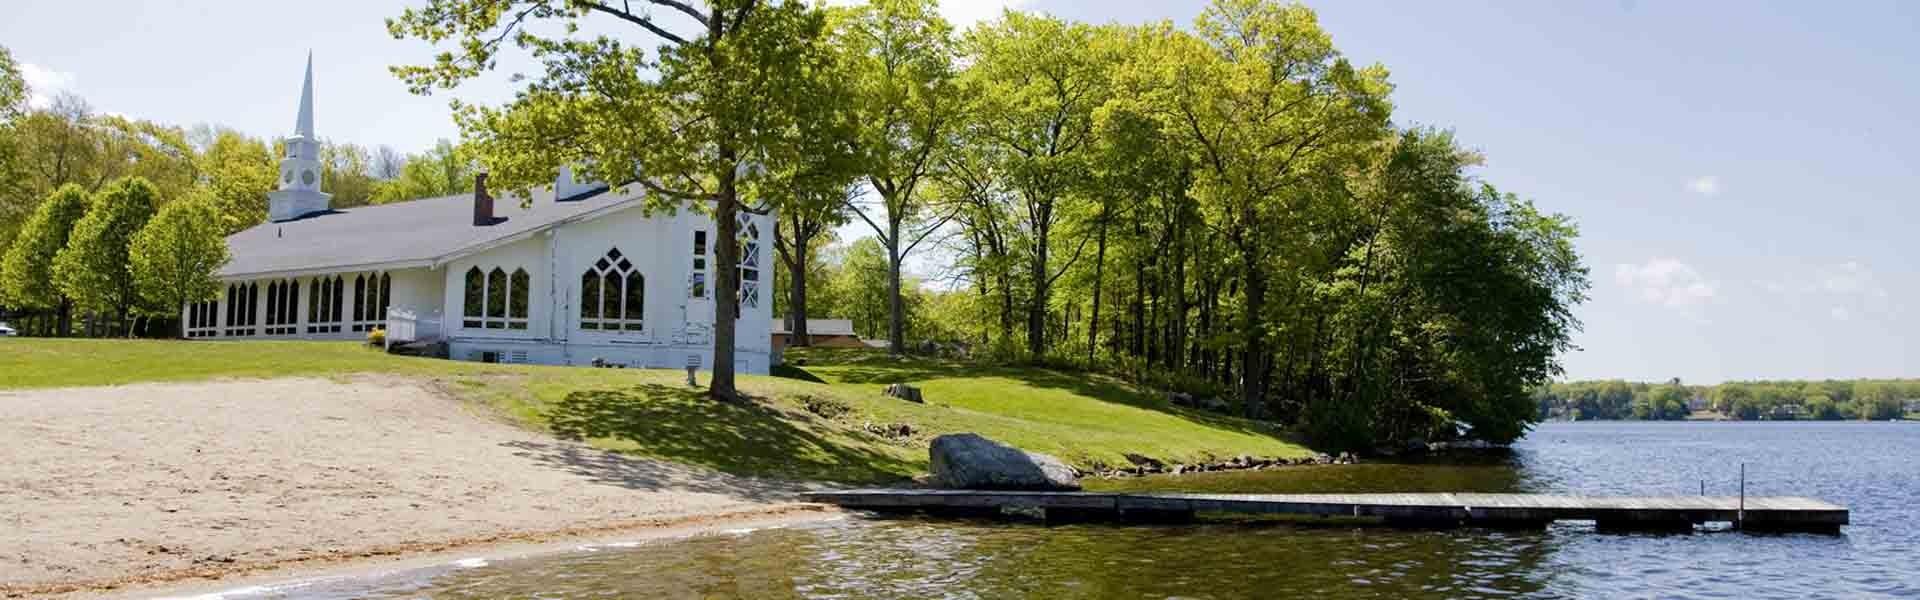 StThomasMooreSchool-Highschool-Connecticut-LakesideCampus-Main-Banner-2019